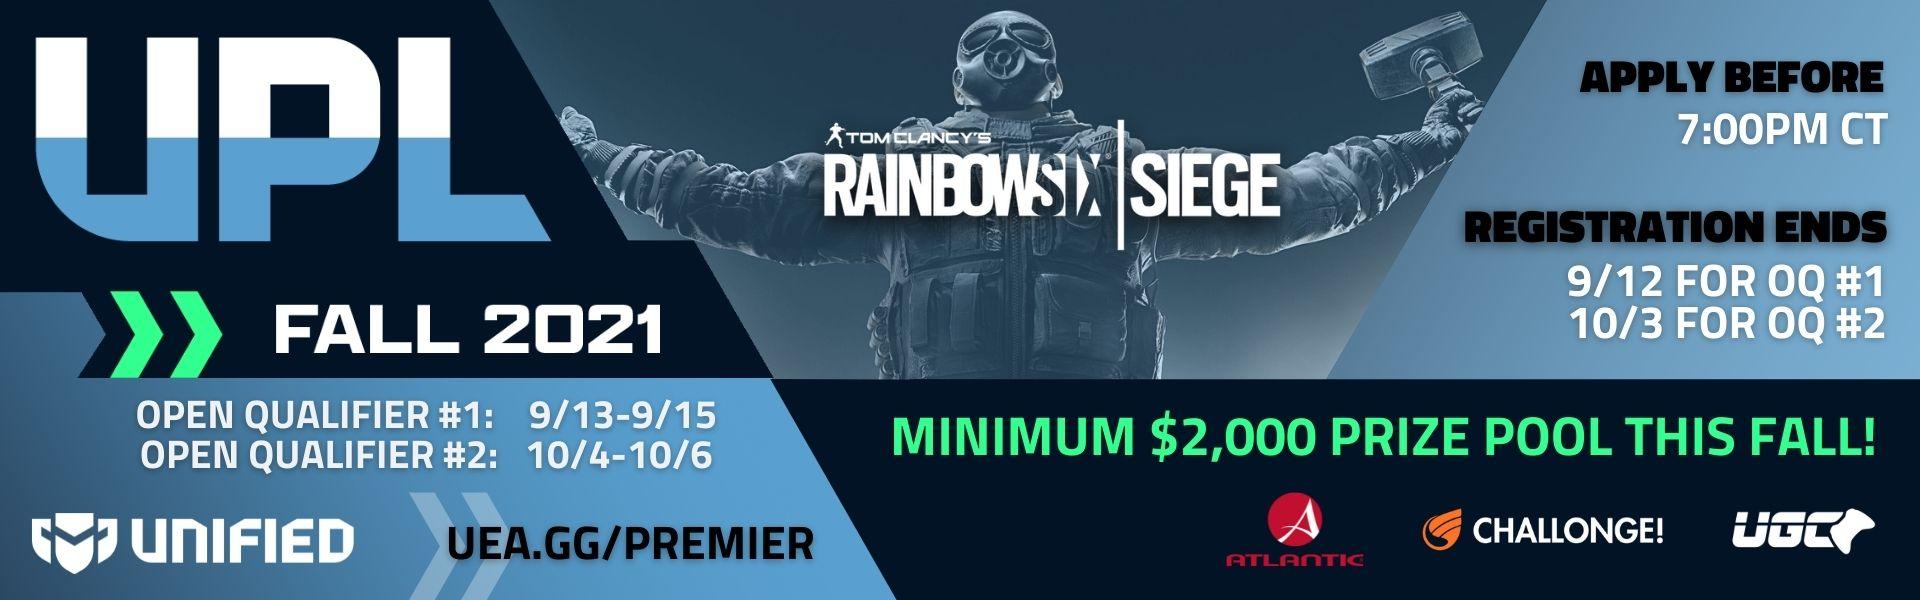 Unified Premier League - Rainbow Six Siege - Fall 2021